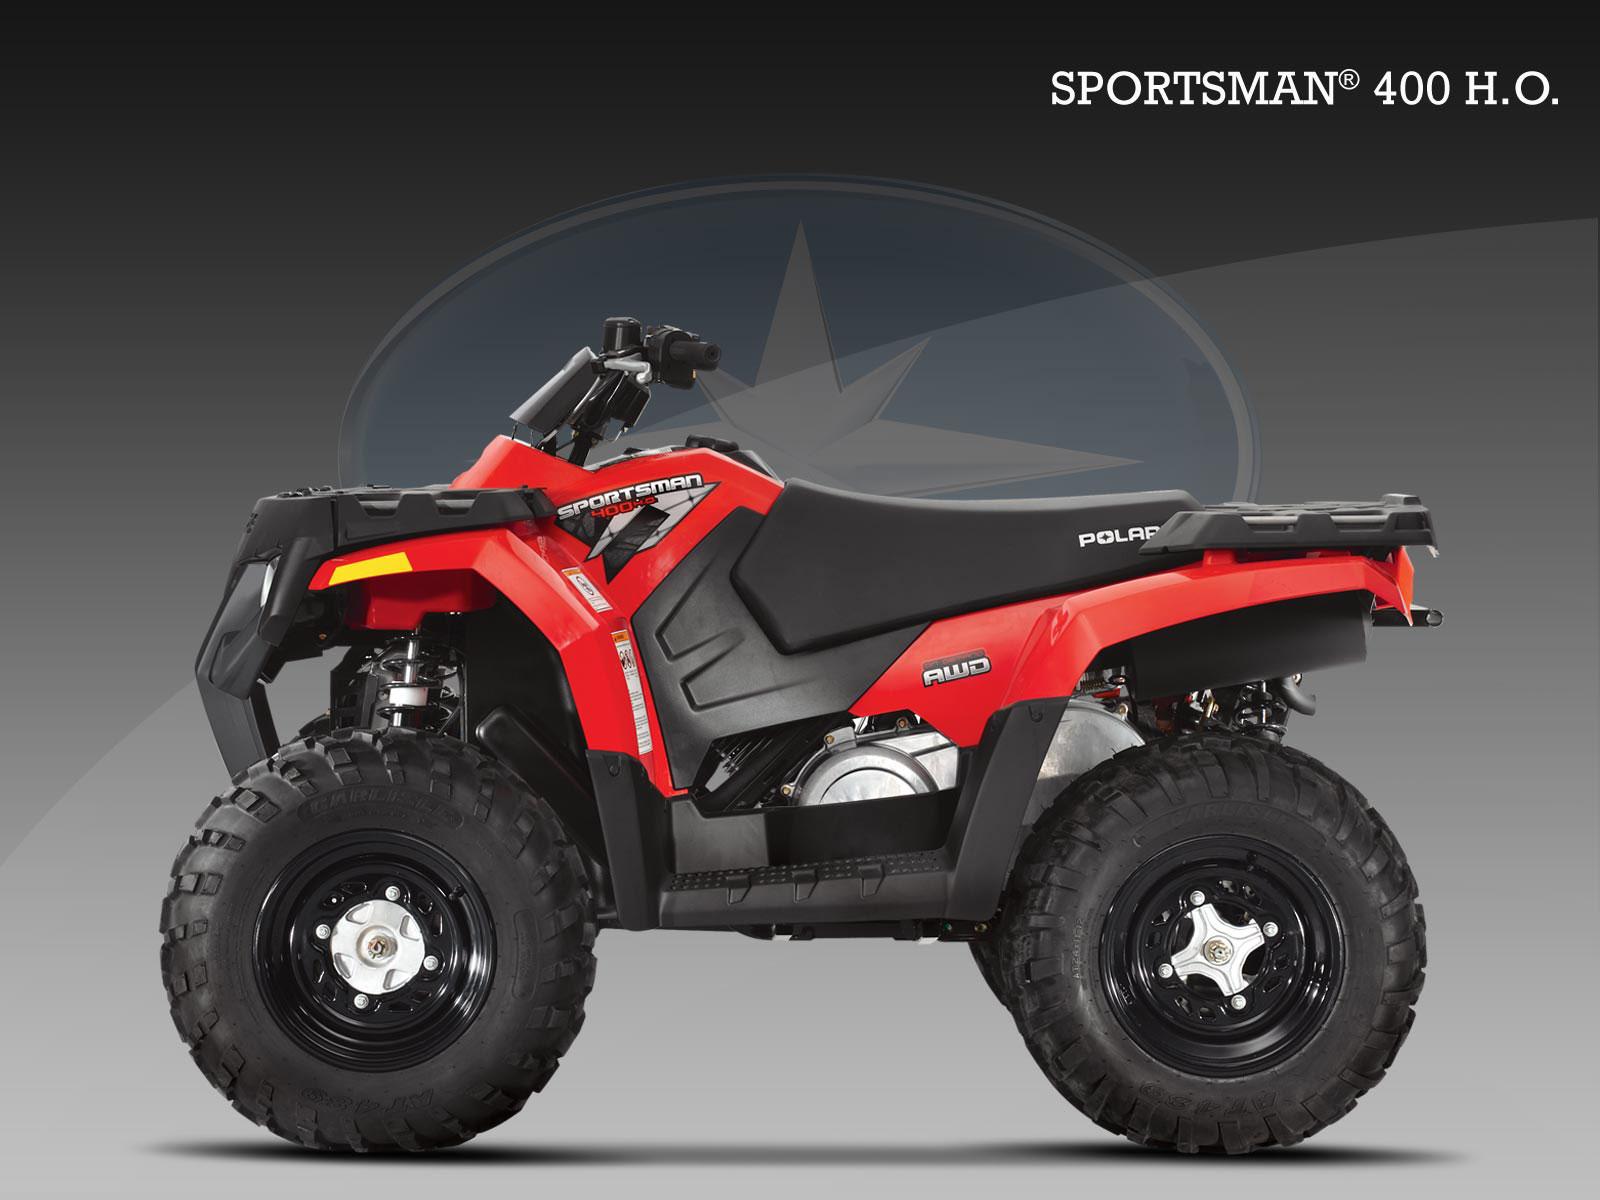 POLARIS Sportsman 400 H.O. specs - 2009, 2010 - autoevolution